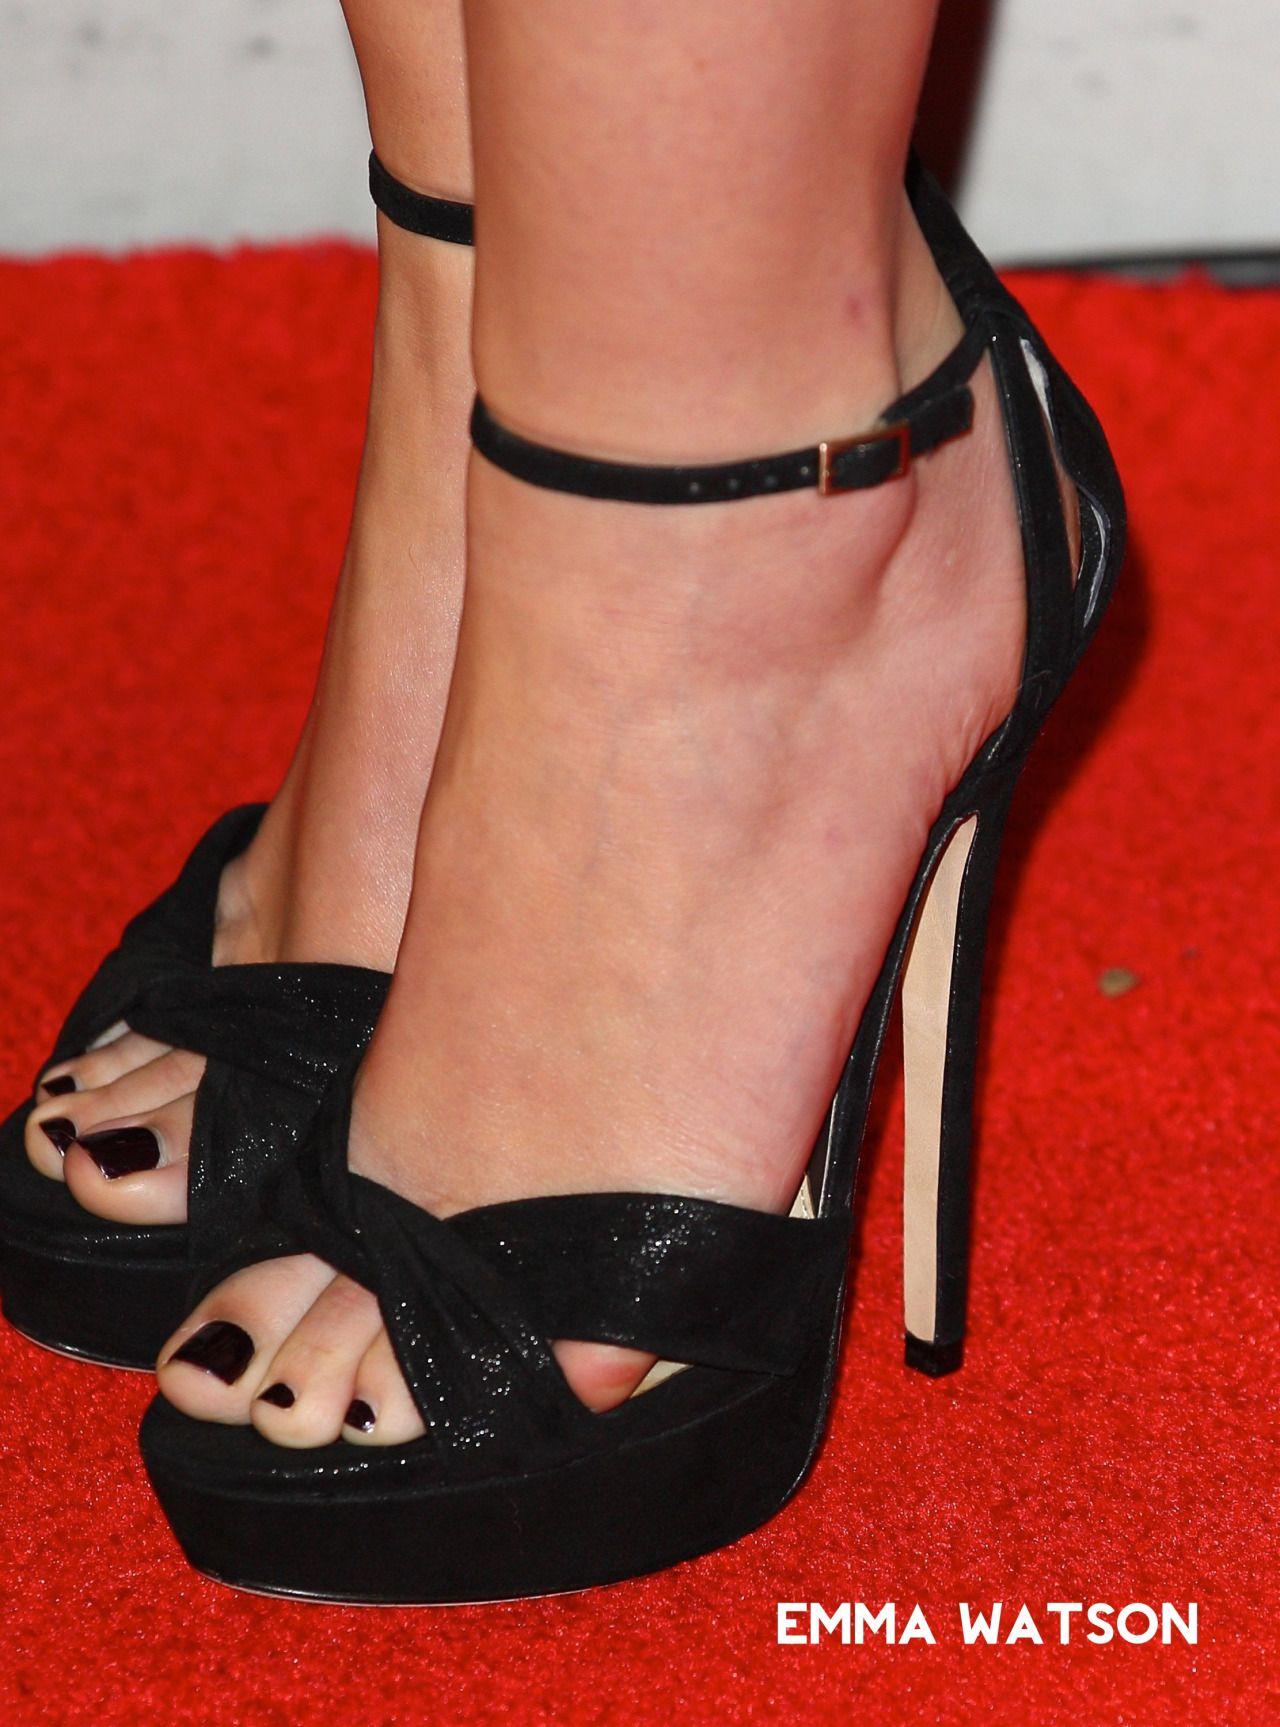 Pin On More Of Girls Feet 1